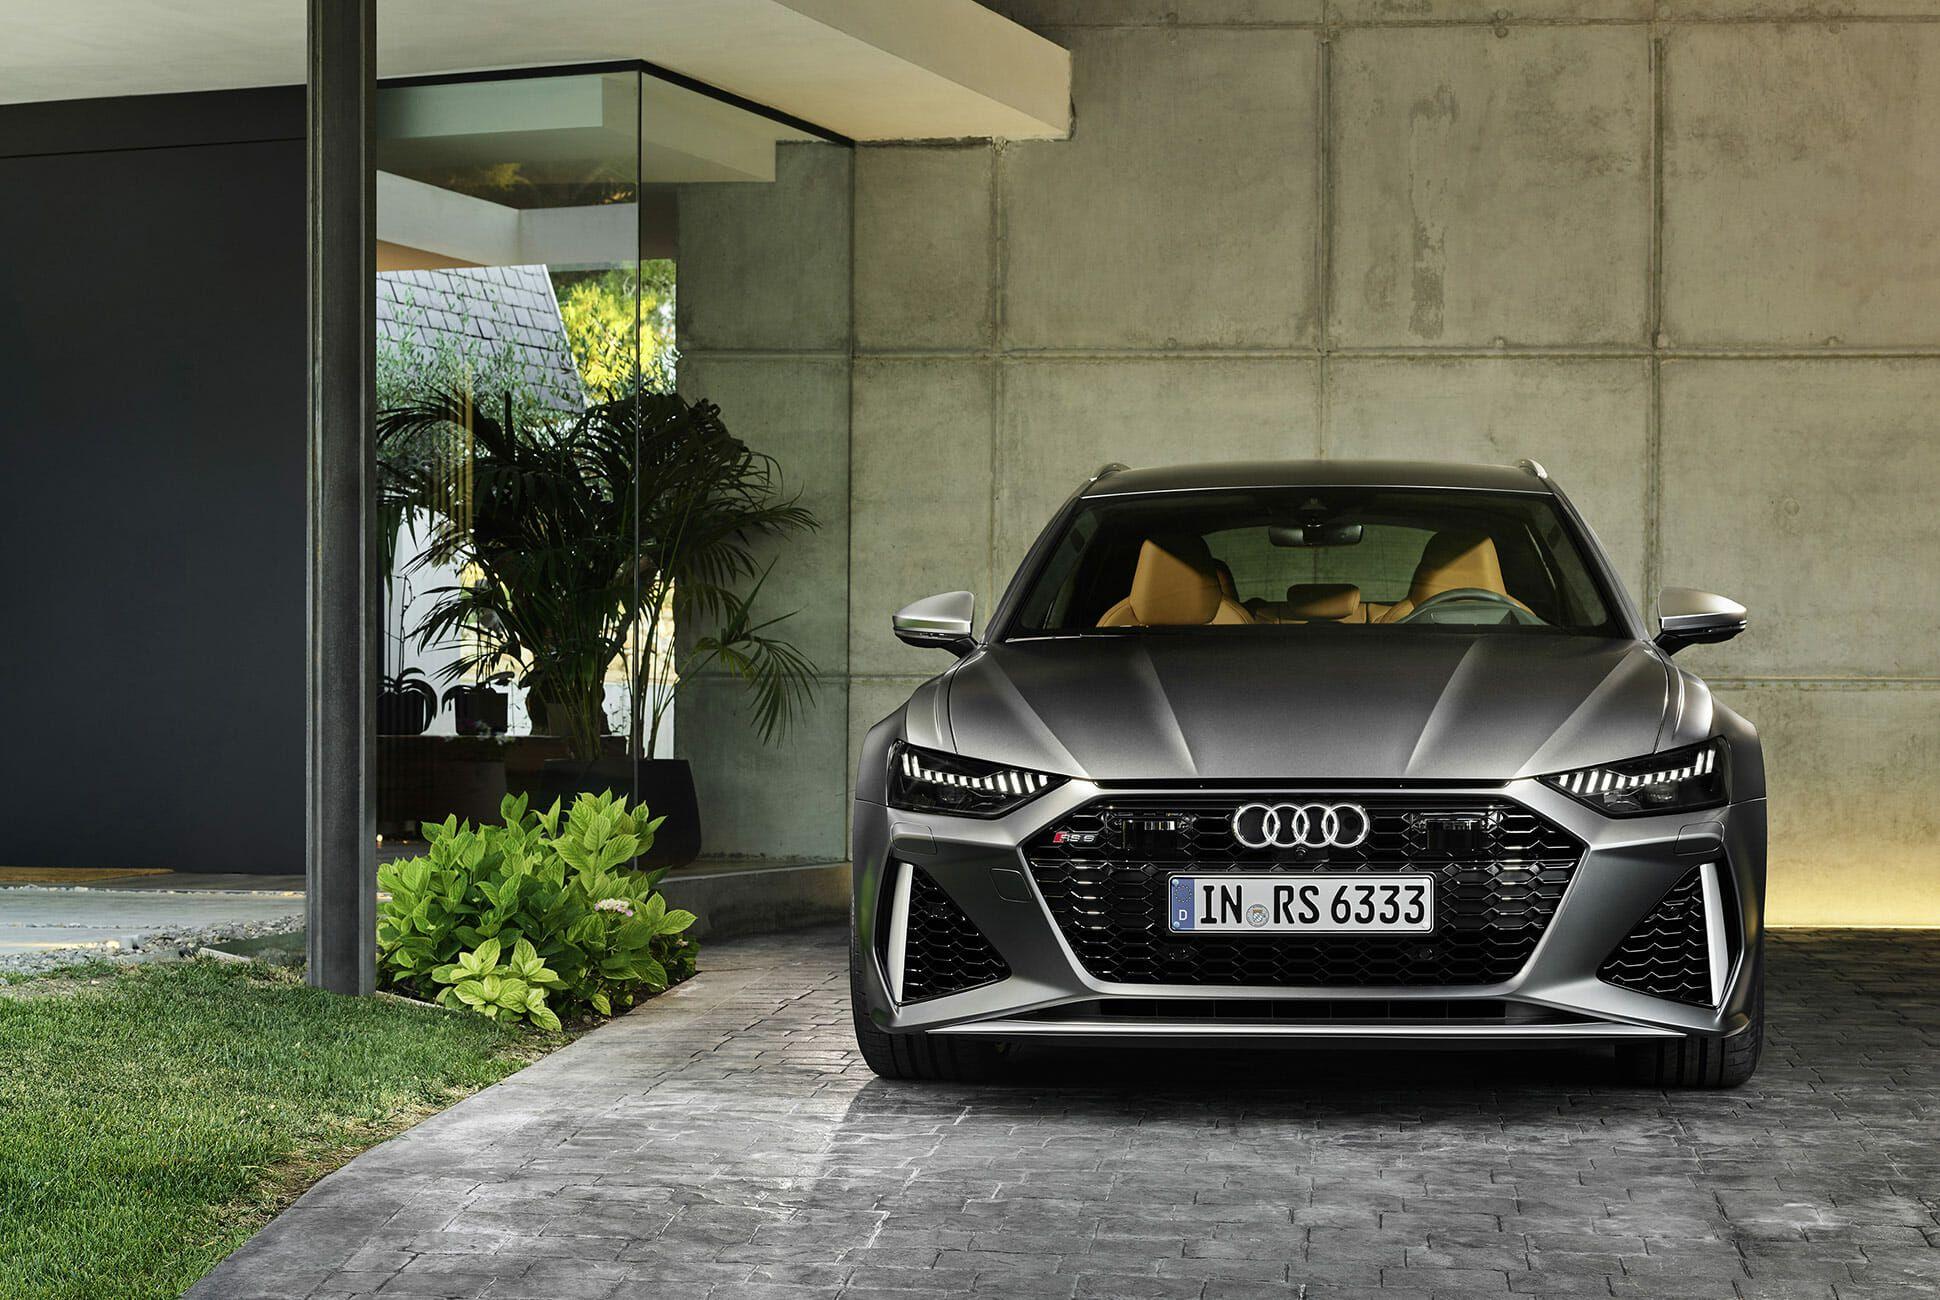 Audi-RS6-Wagon-gear-patrol-slide-6